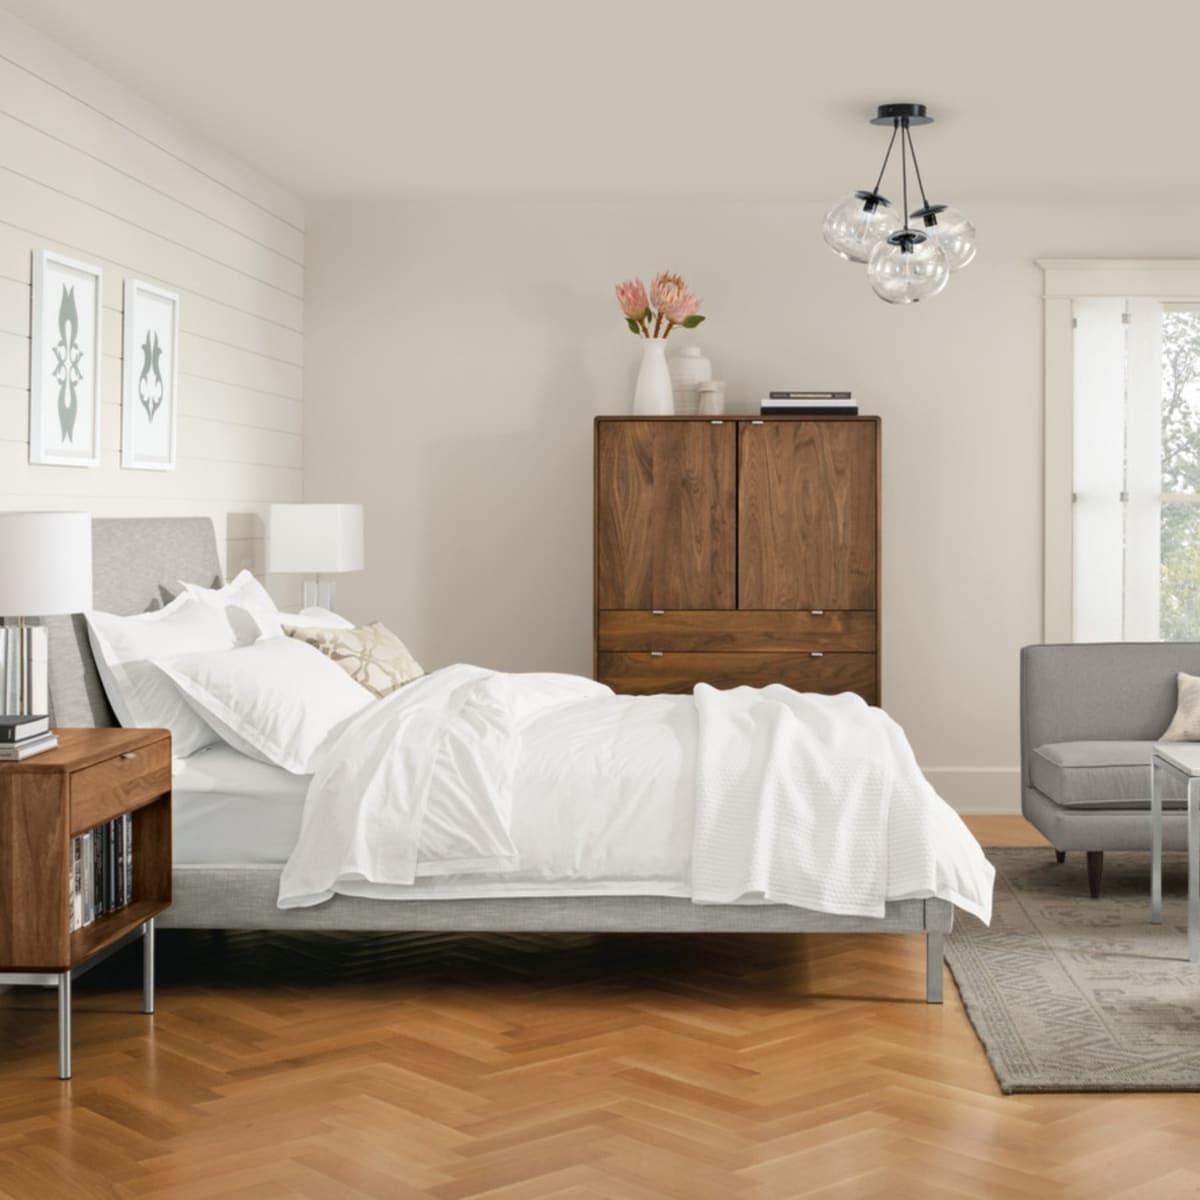 Modern furniture favorite picks Dallas district for first Texas ...